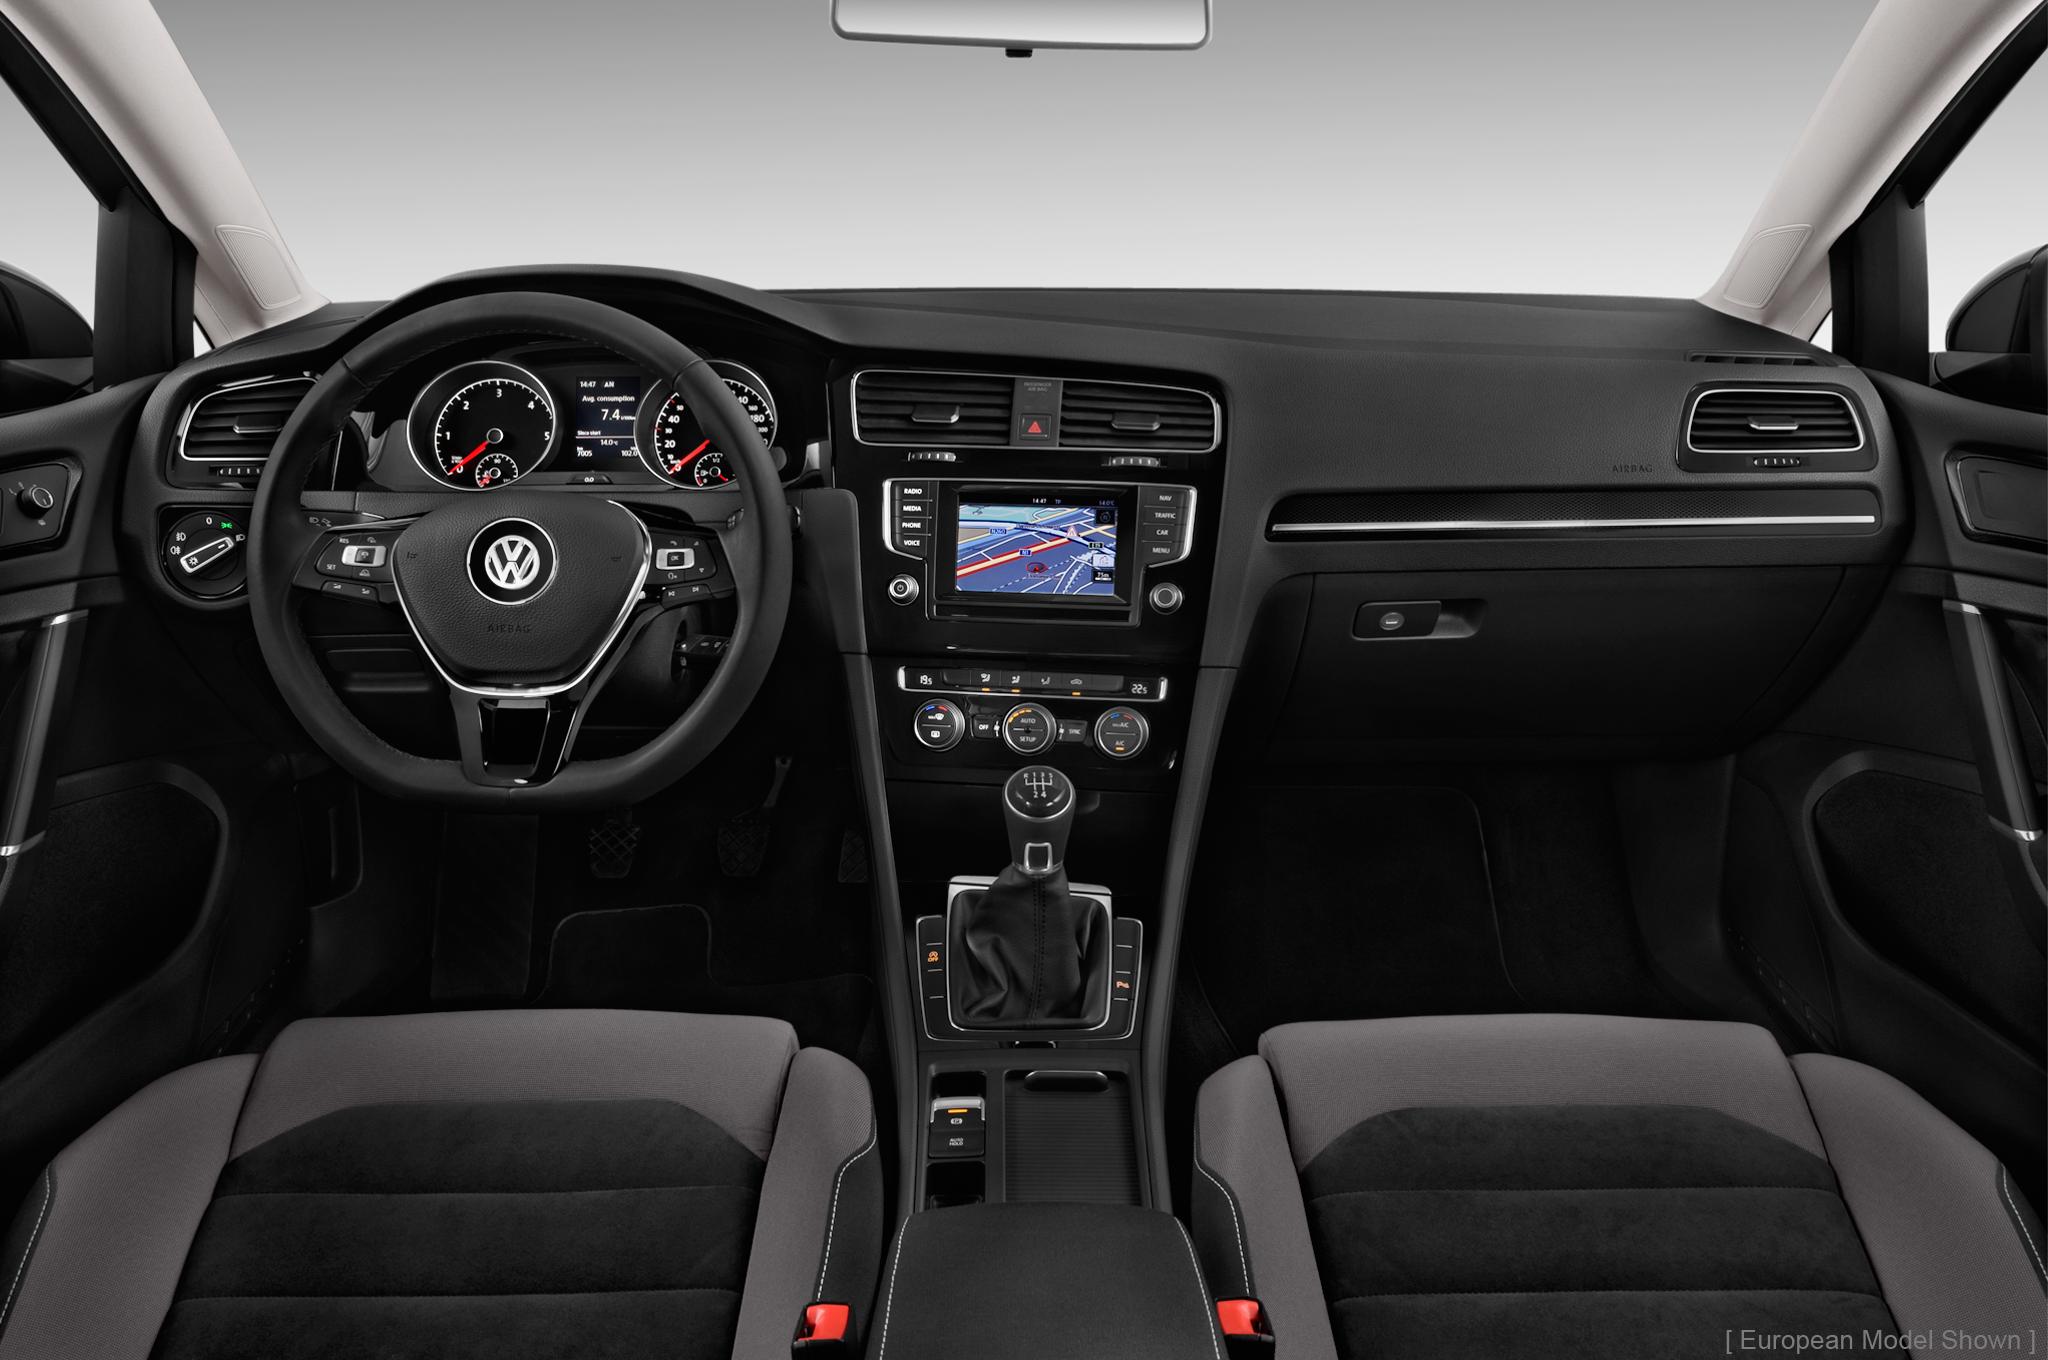 Toyota Corolla Mpg >> 2014 Volkswagen Golf GTD - First Look - Automobile Magazine